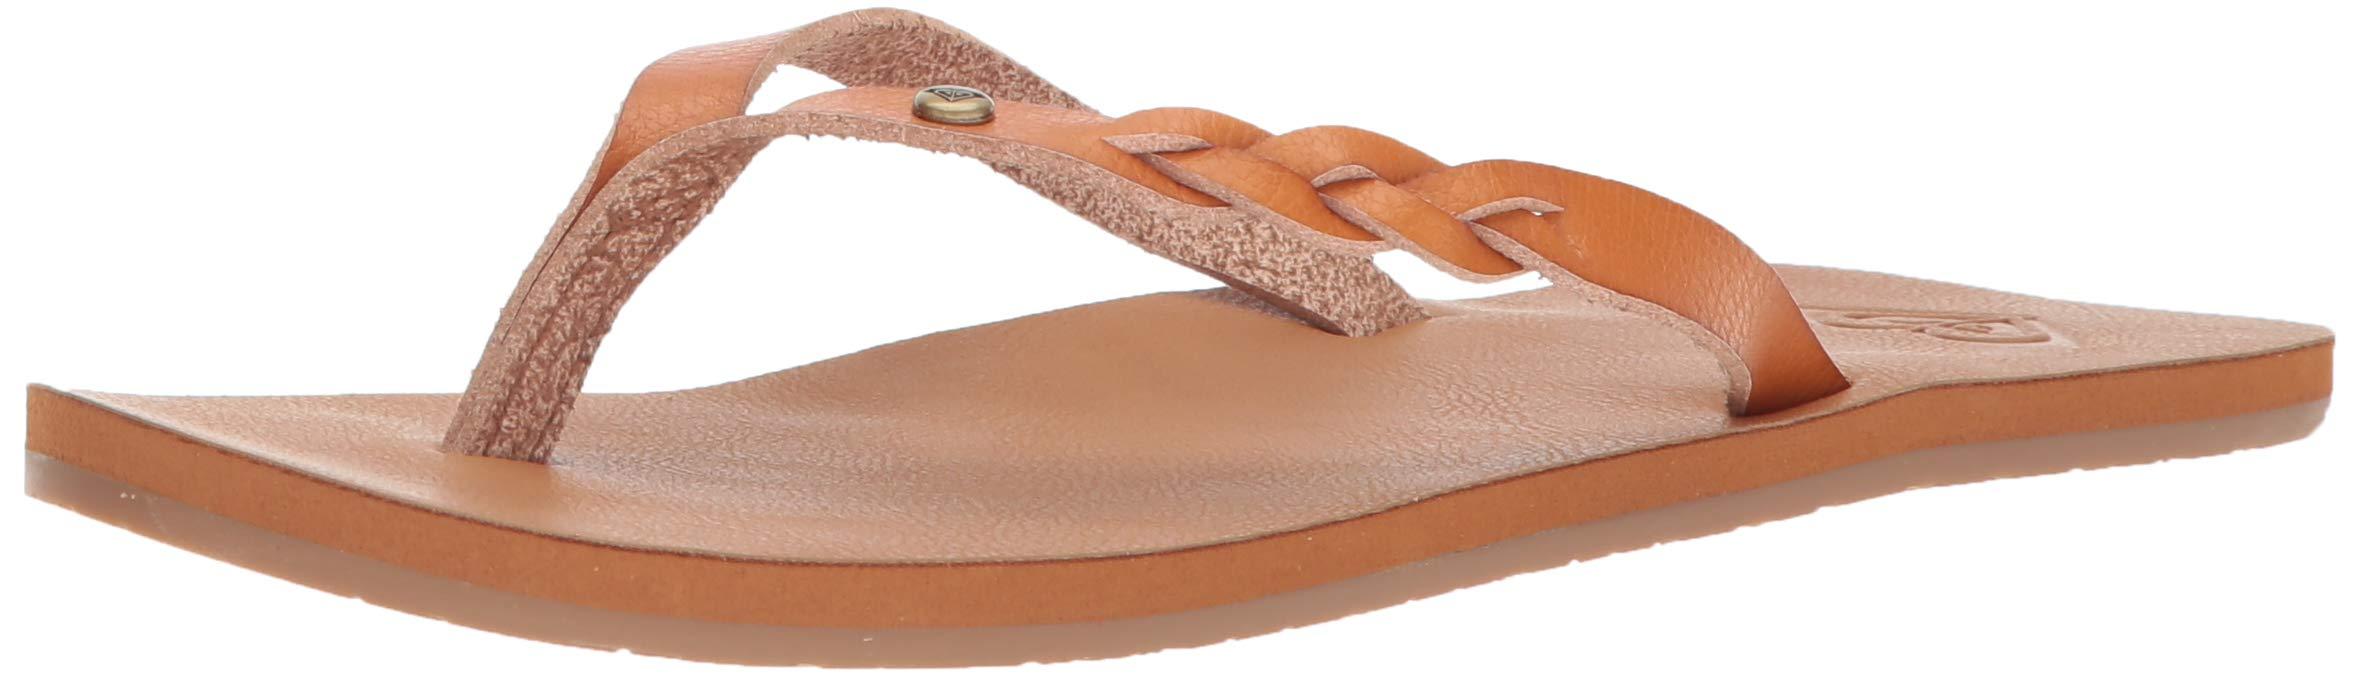 Roxy Womens Sandal Flip Flop Brown